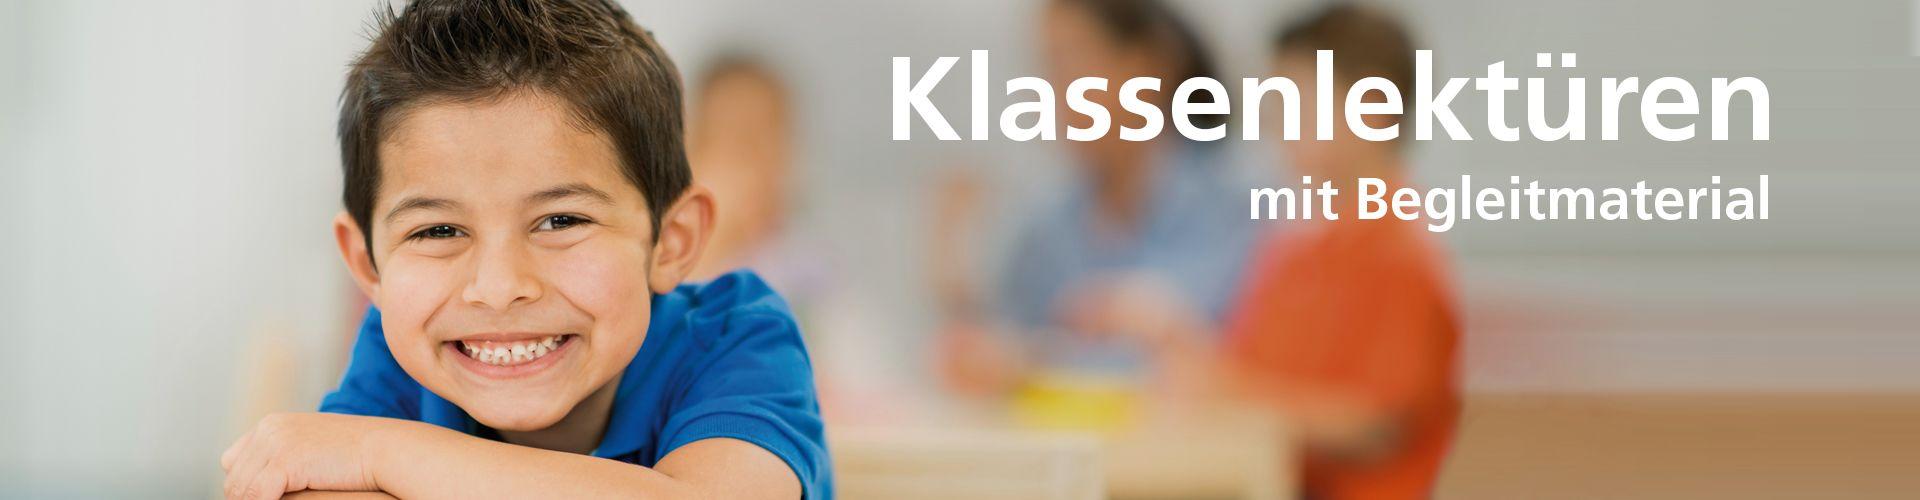 Hase und Igel Verlag - Klassenlektüren